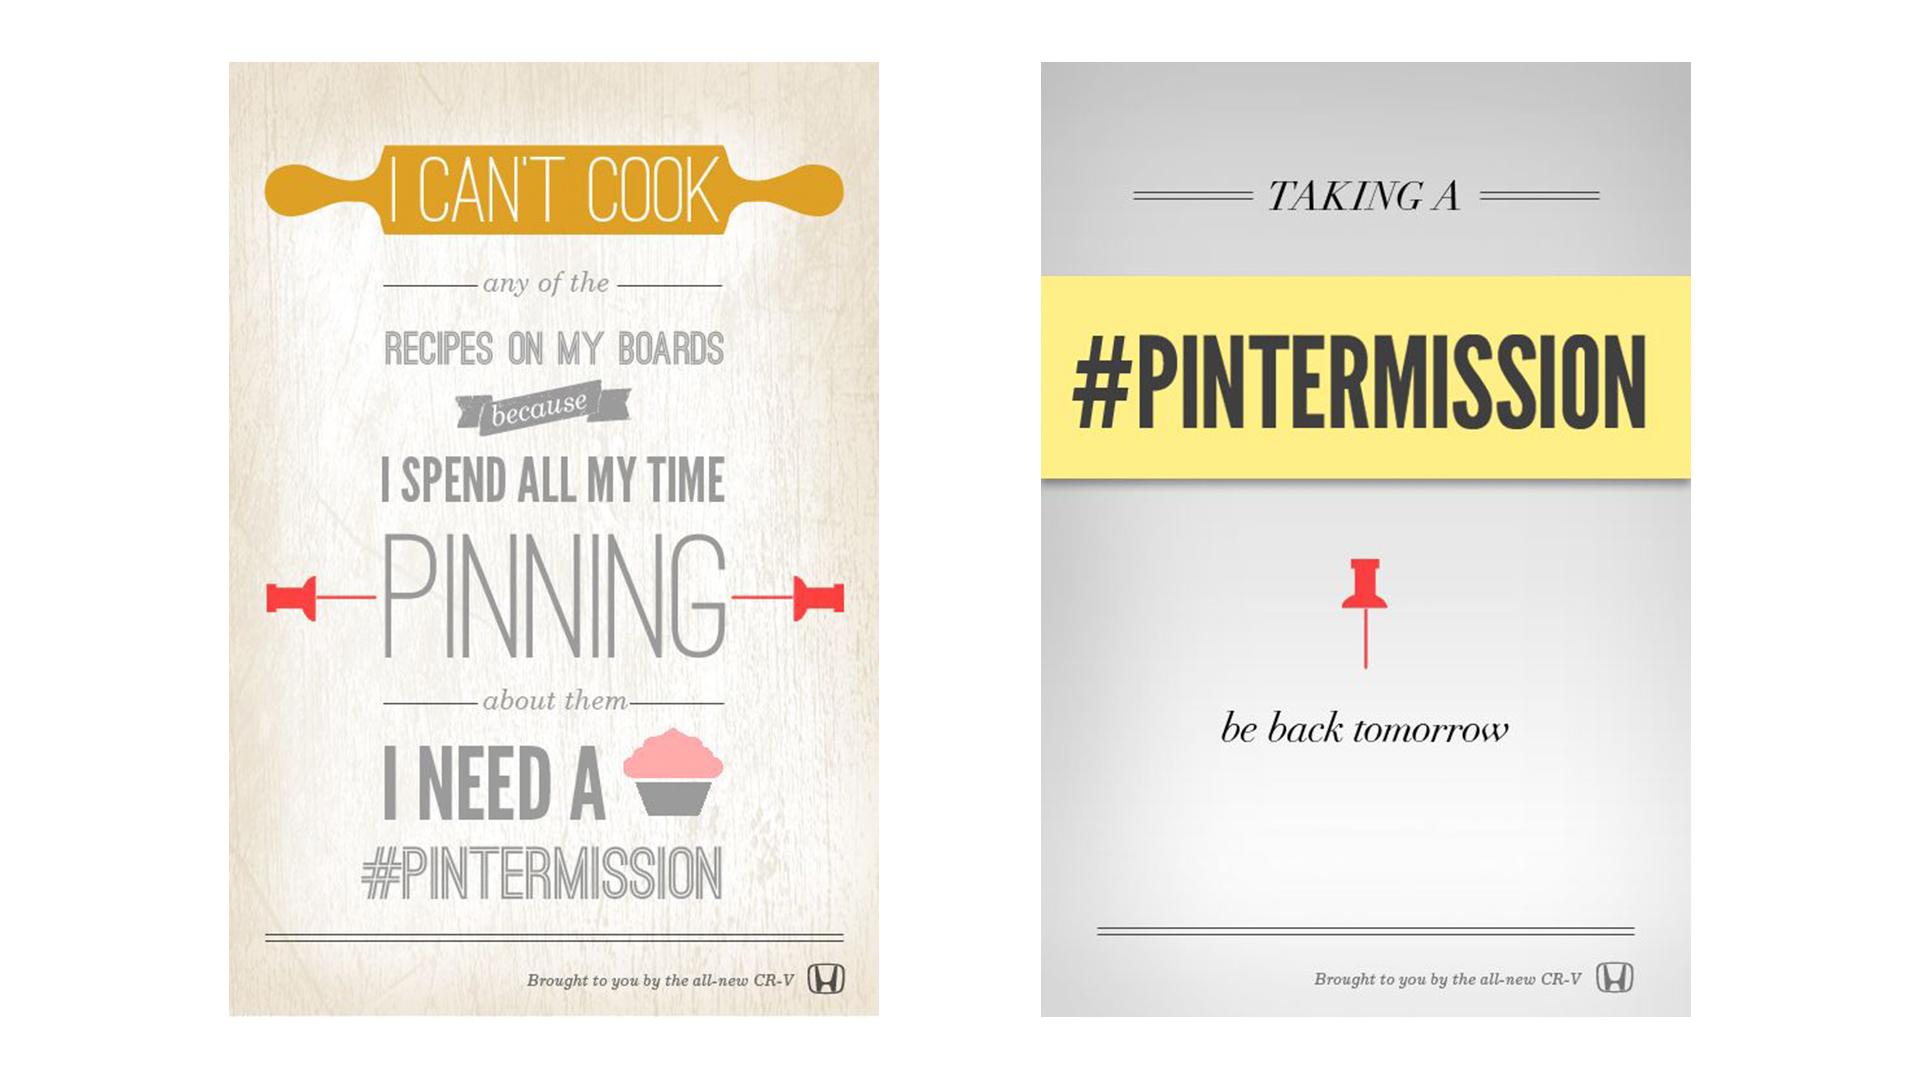 pinterest_2.png